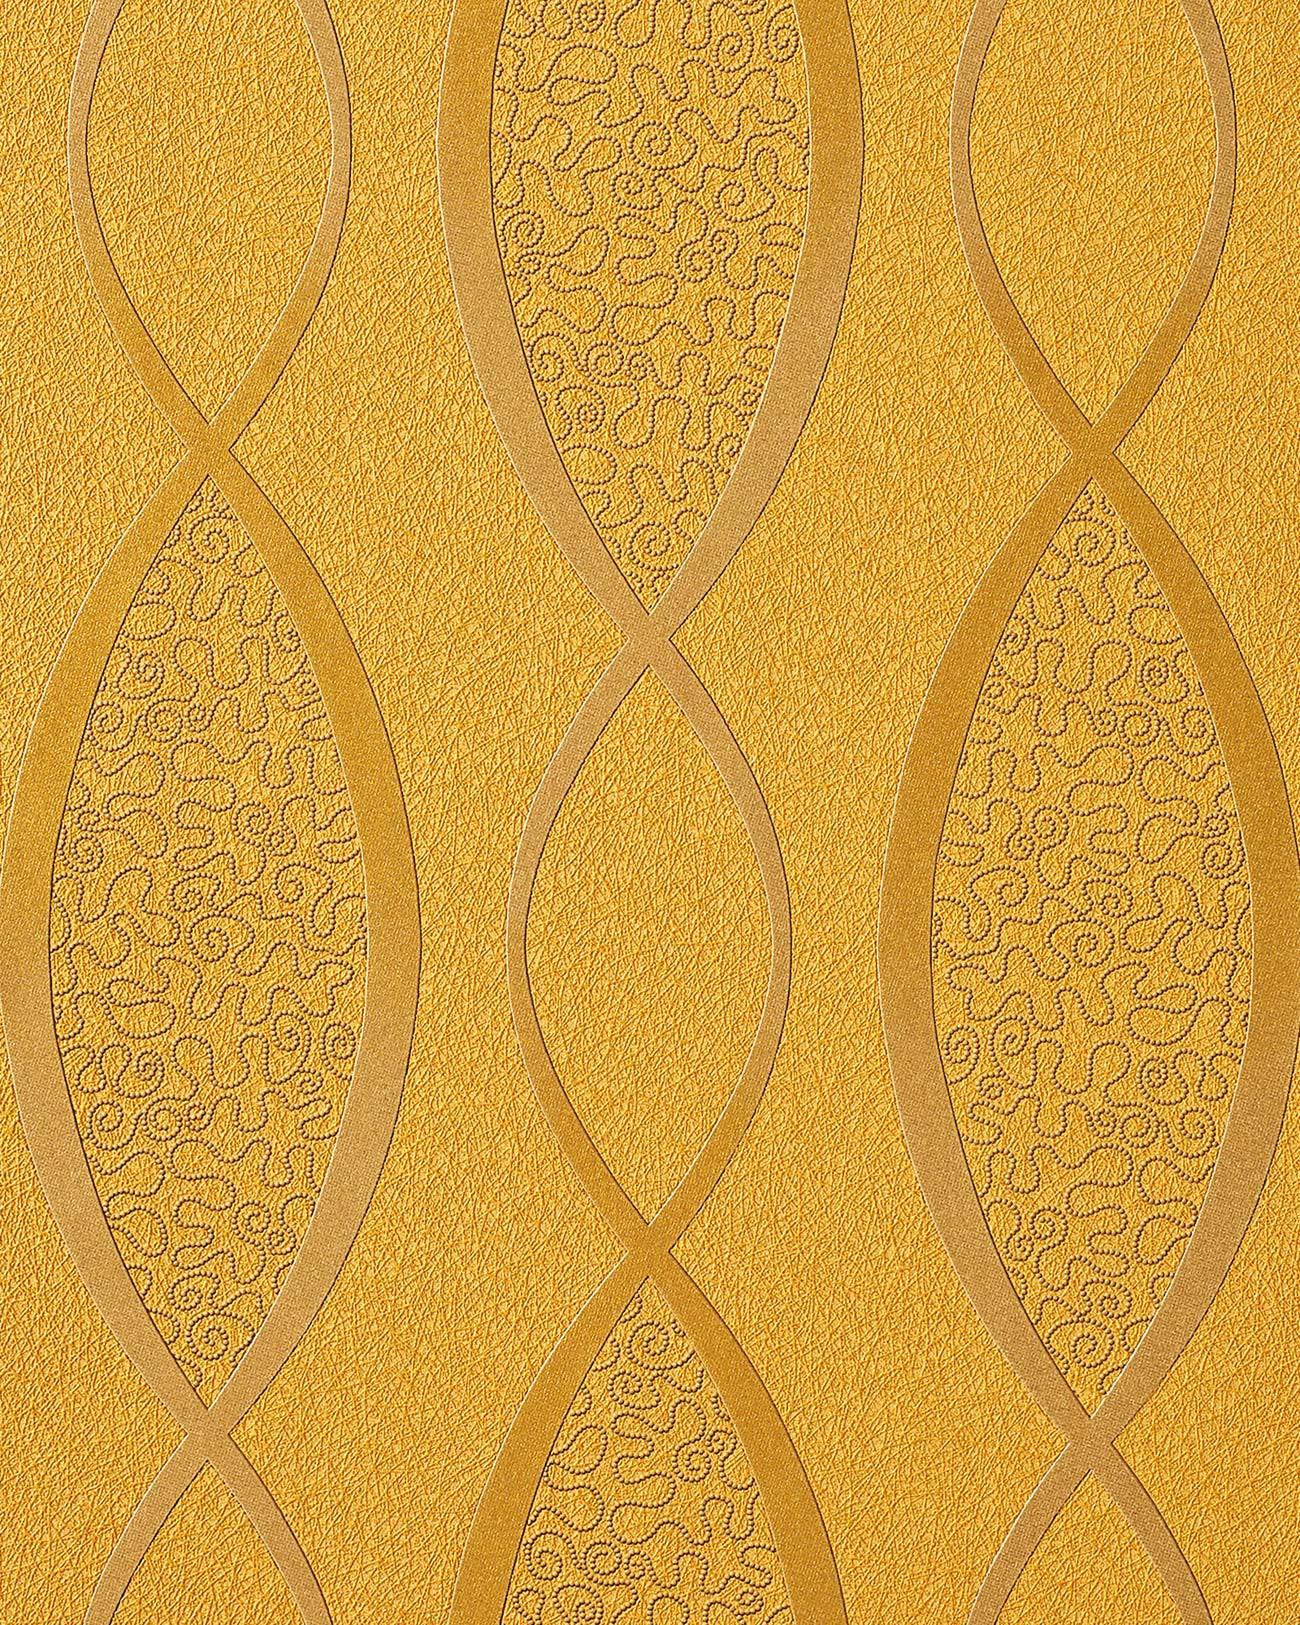 Ongekend Design behangpapier vinyl abstract strepen EDEM 1018-11 motief TJ-71